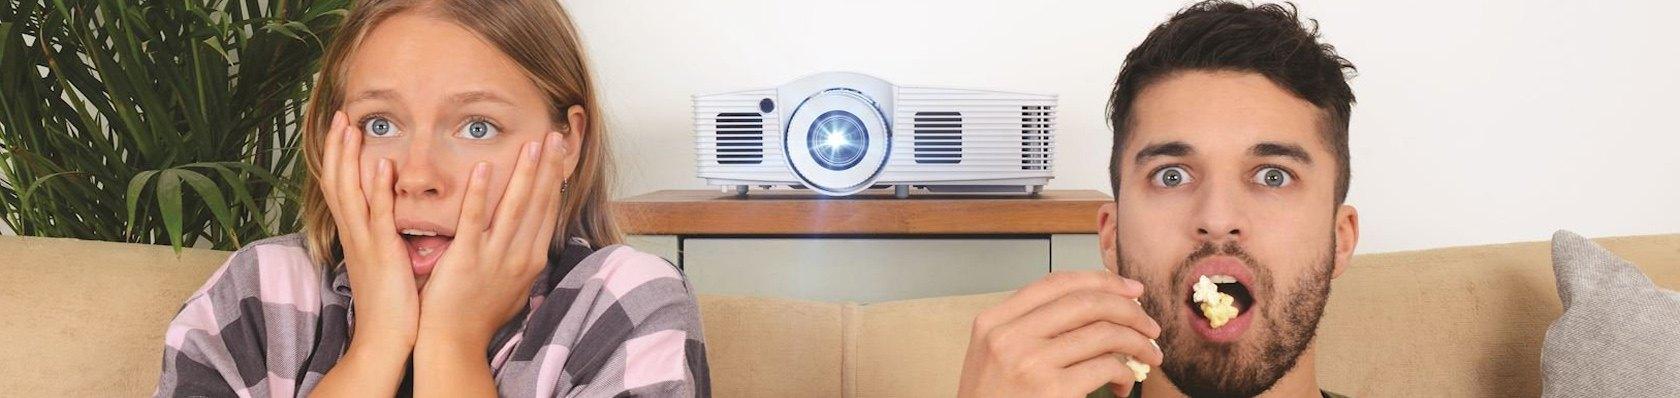 Full HD Beamer im Test auf ExpertenTesten.de